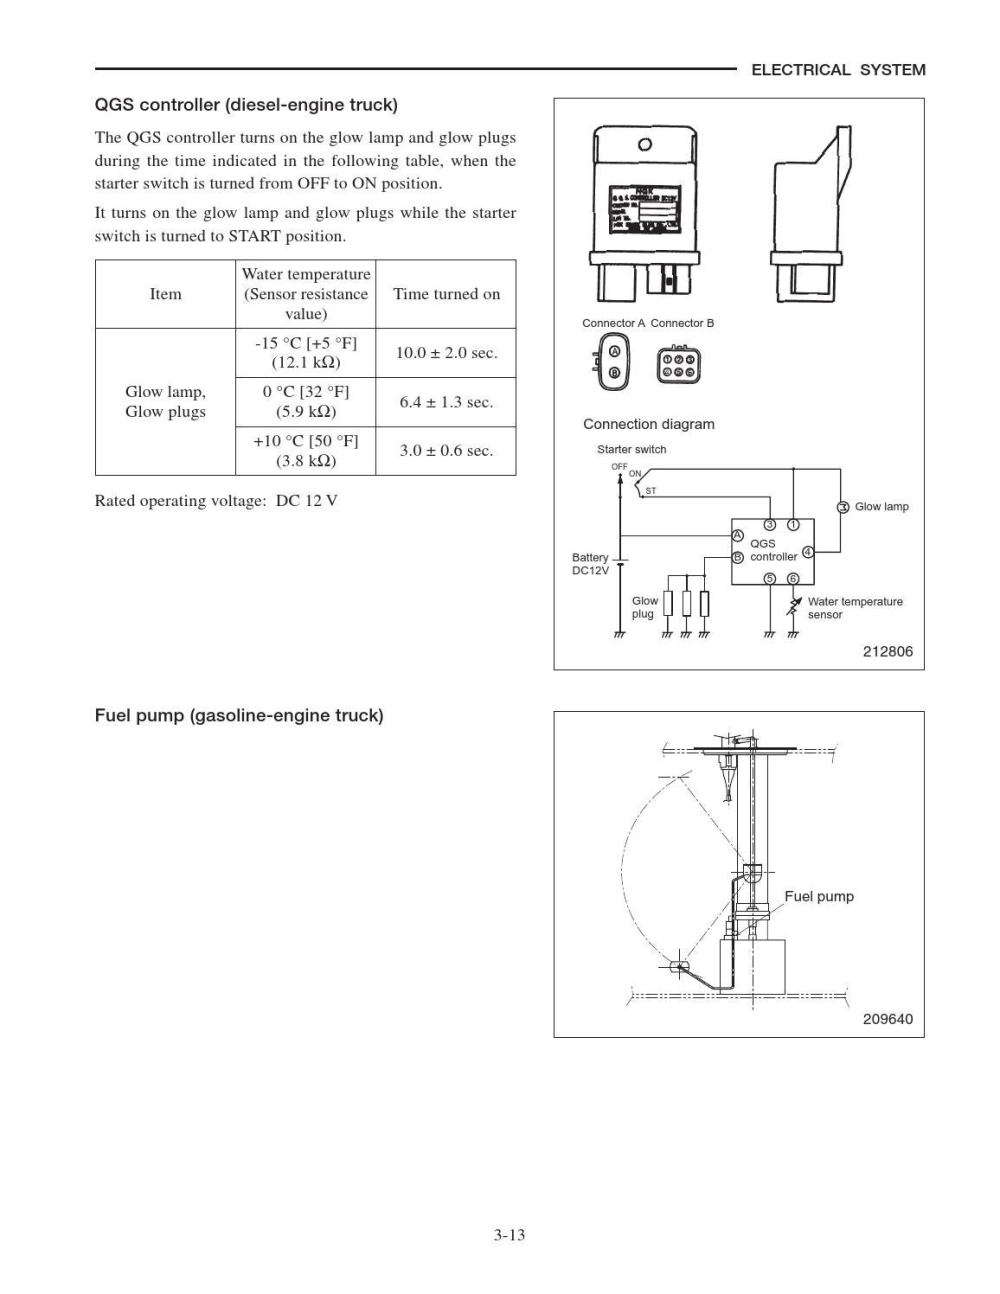 medium resolution of caterpillar ignition switch wiring diagram data wiring diagram cat fork lift ignition switch wiring diagram